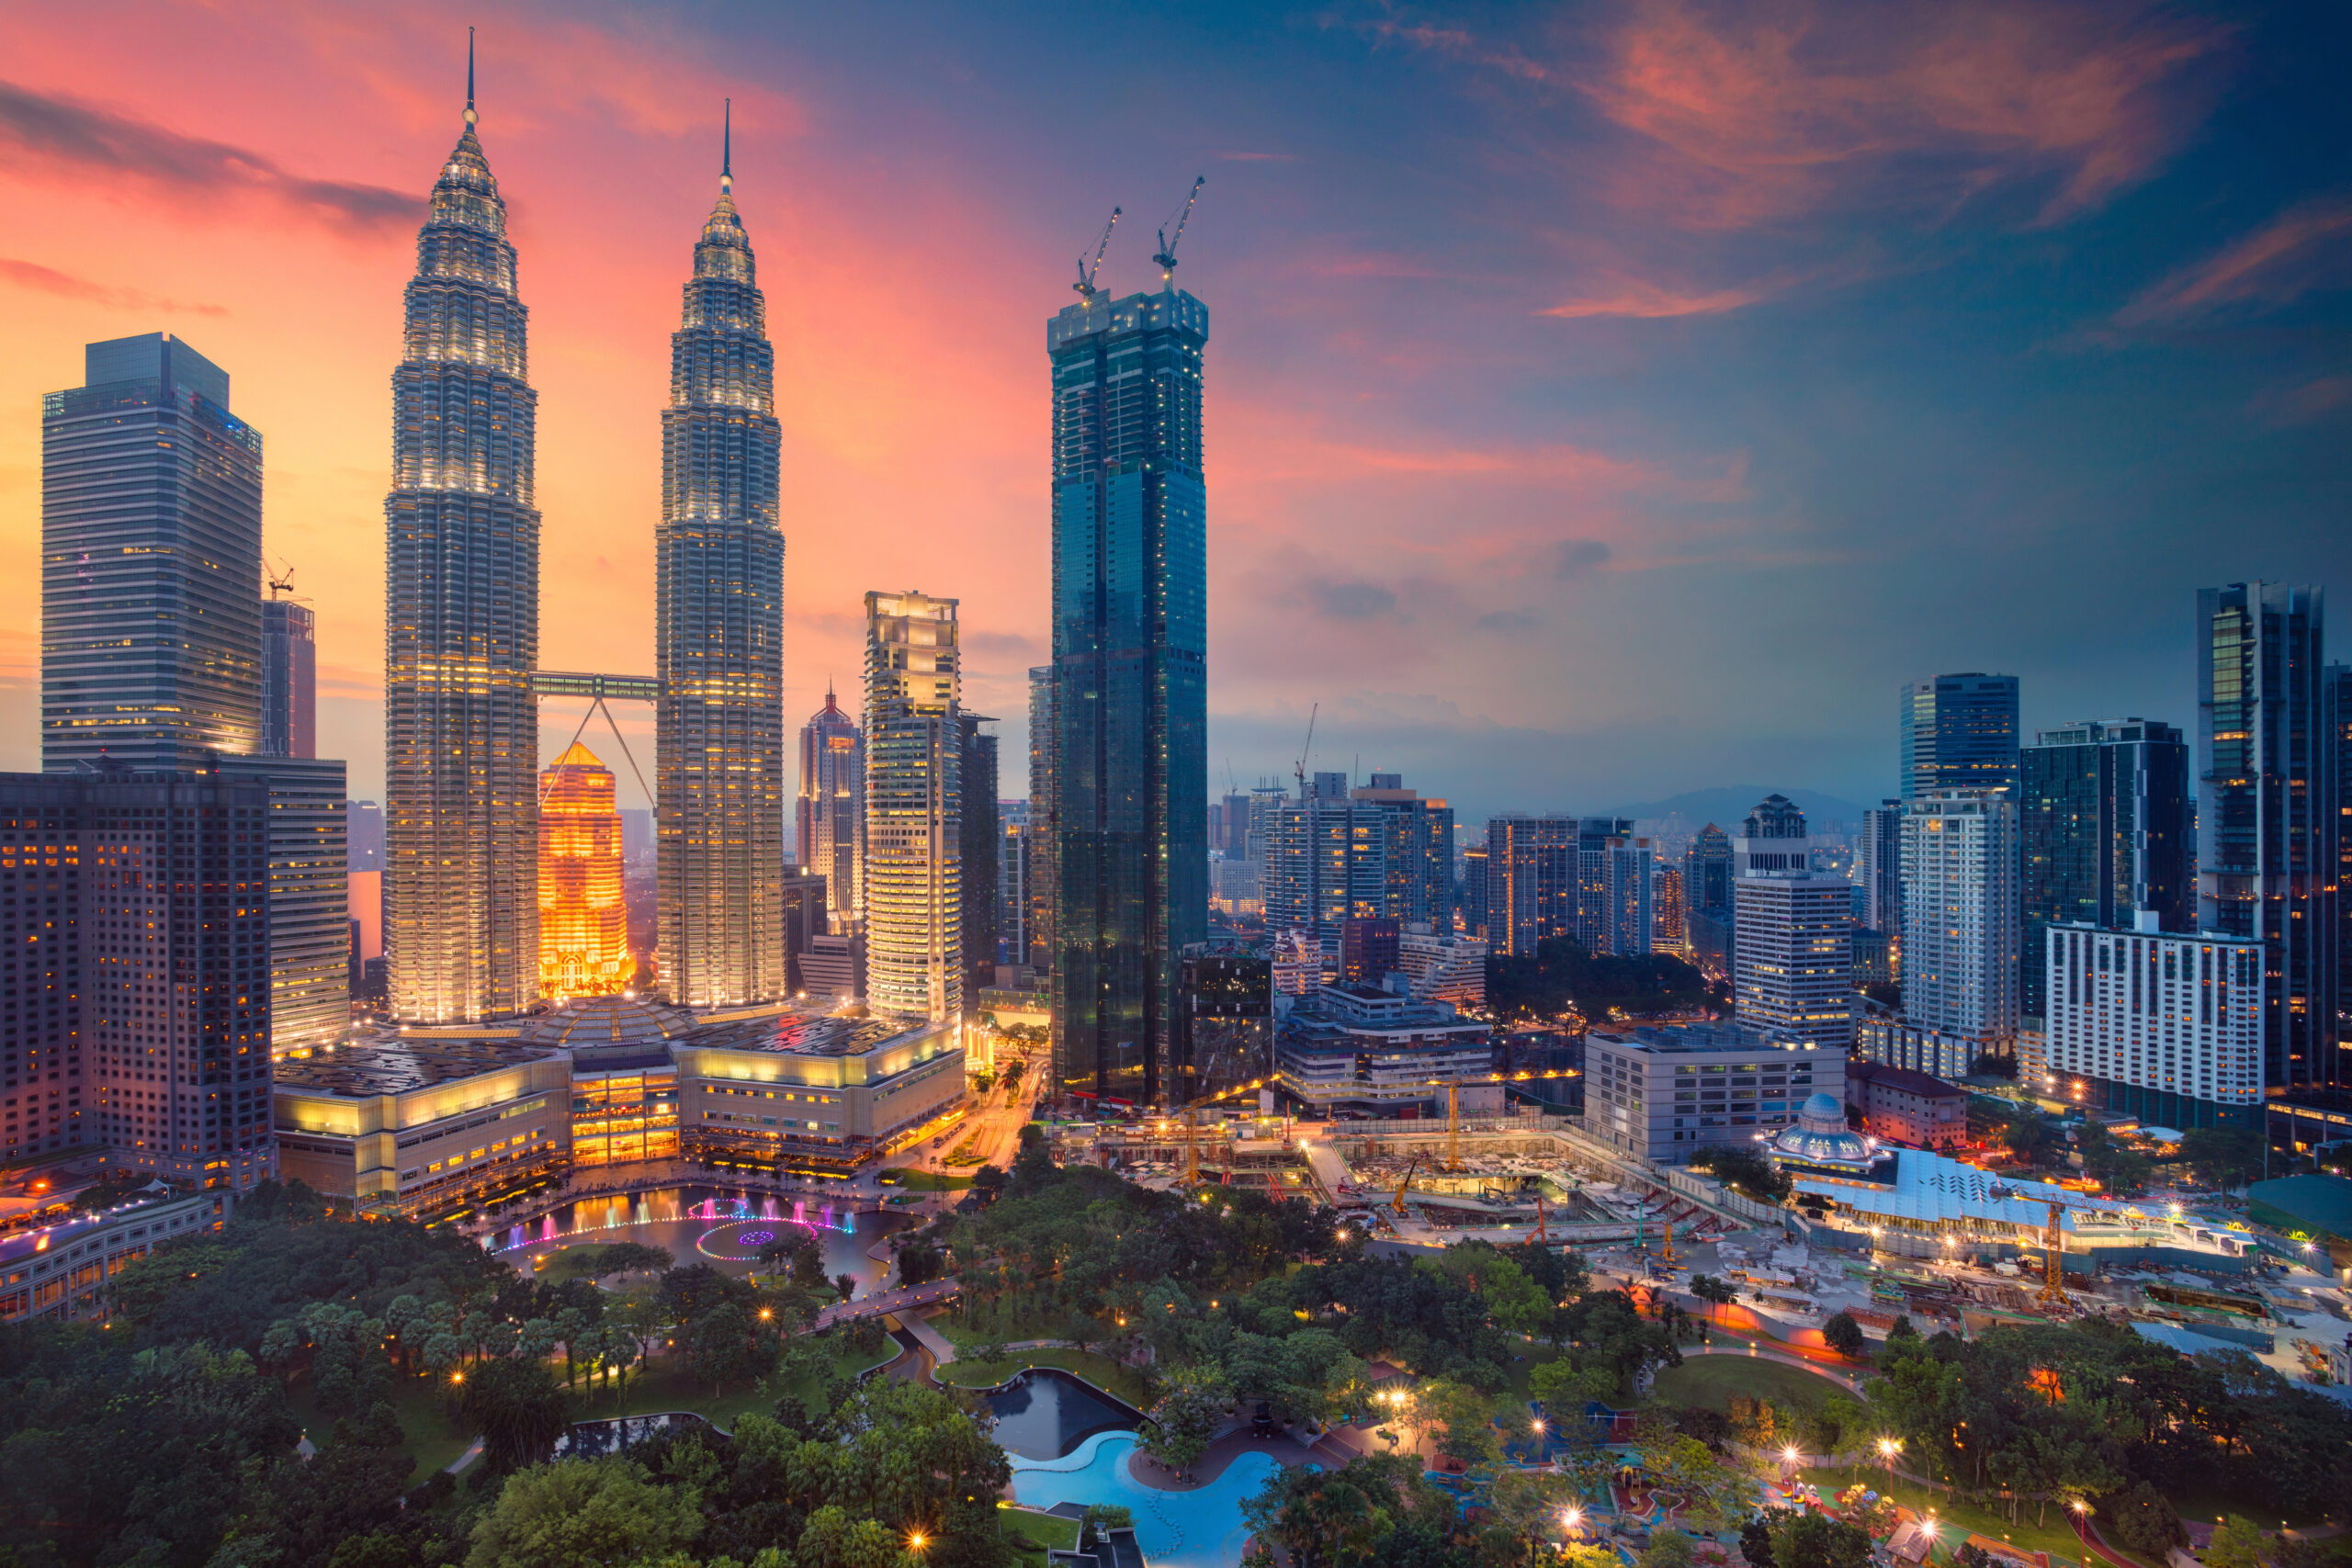 Kuala Lumpur city skyline during the sunset